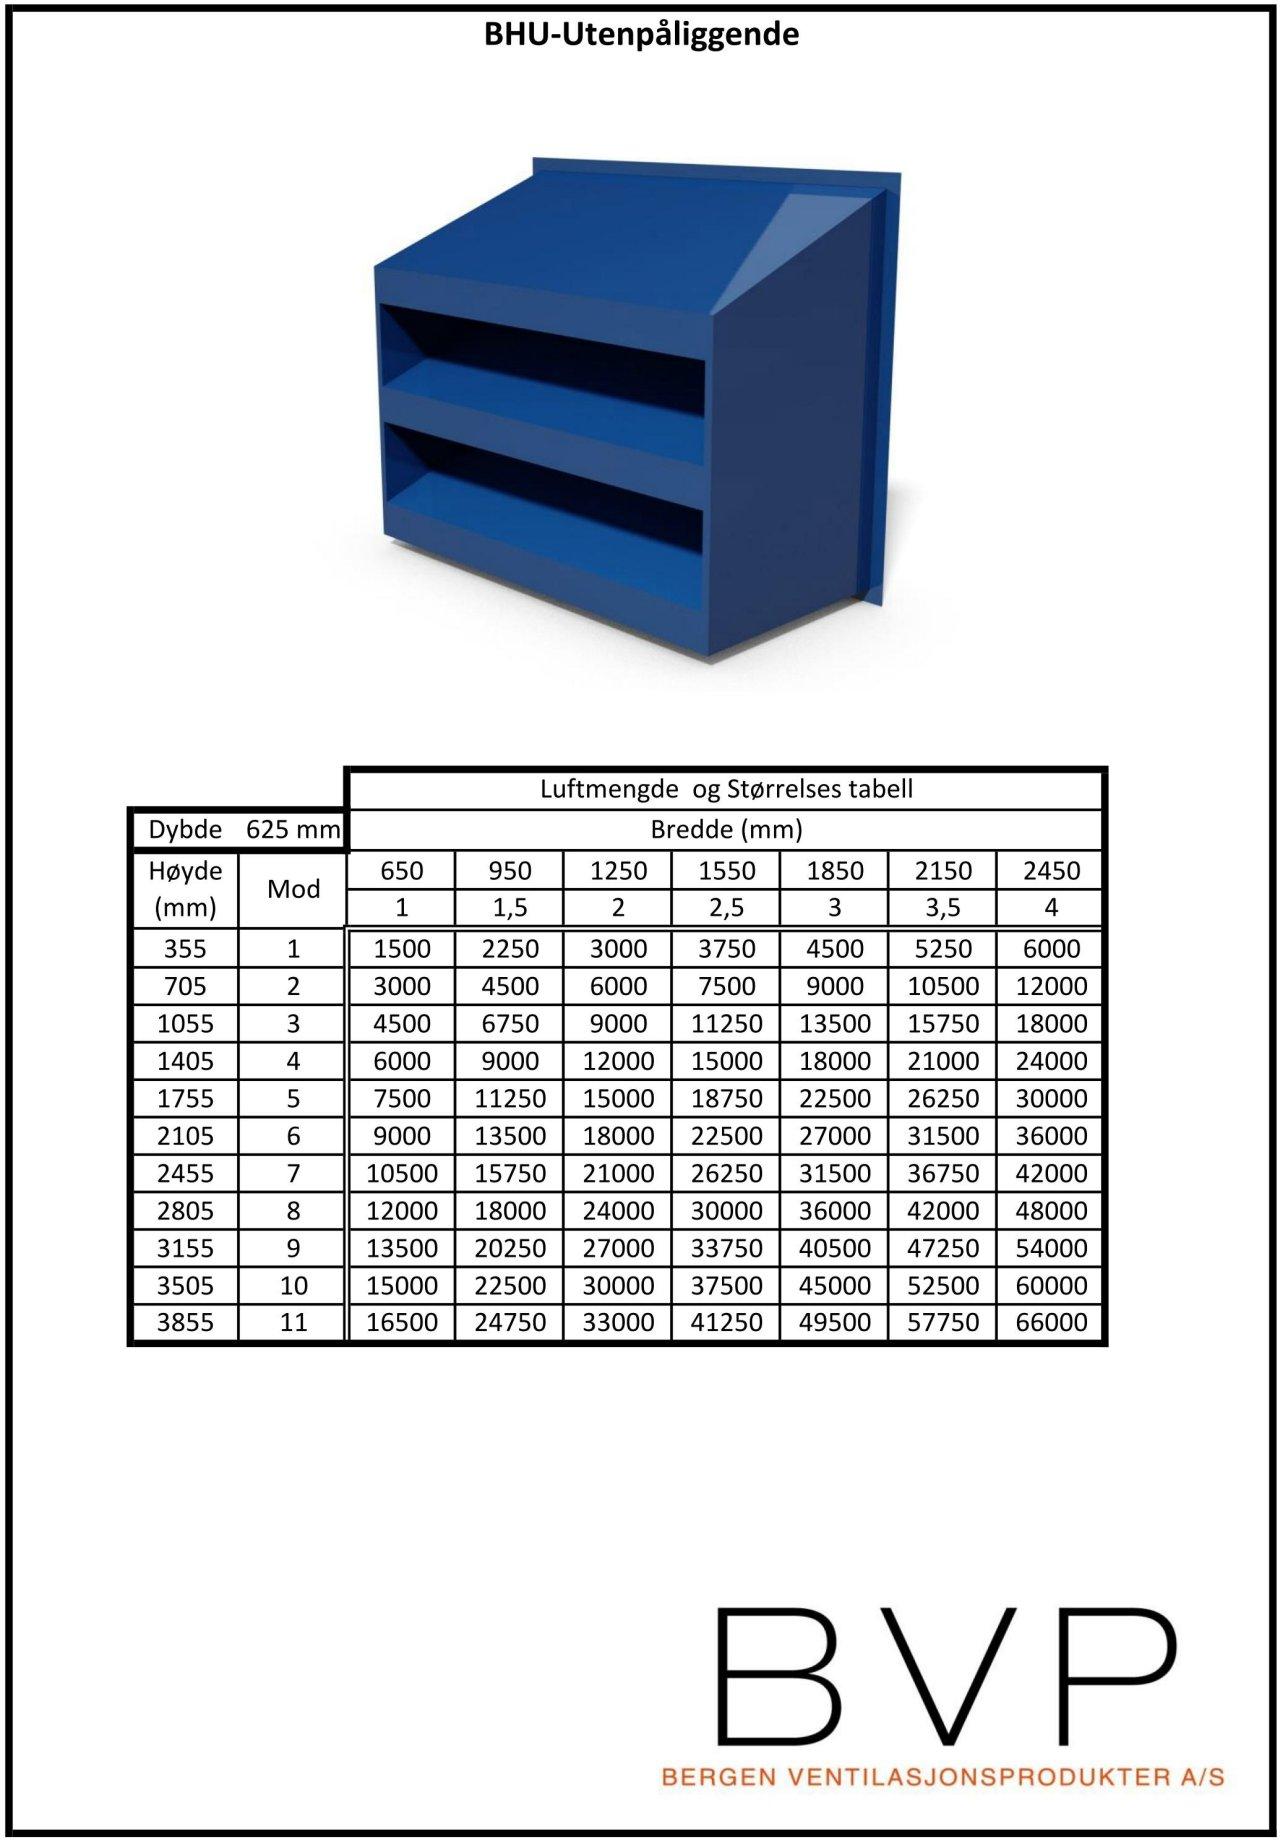 bhu-utenpaliggende-bergensrist-tekniske-data-1280